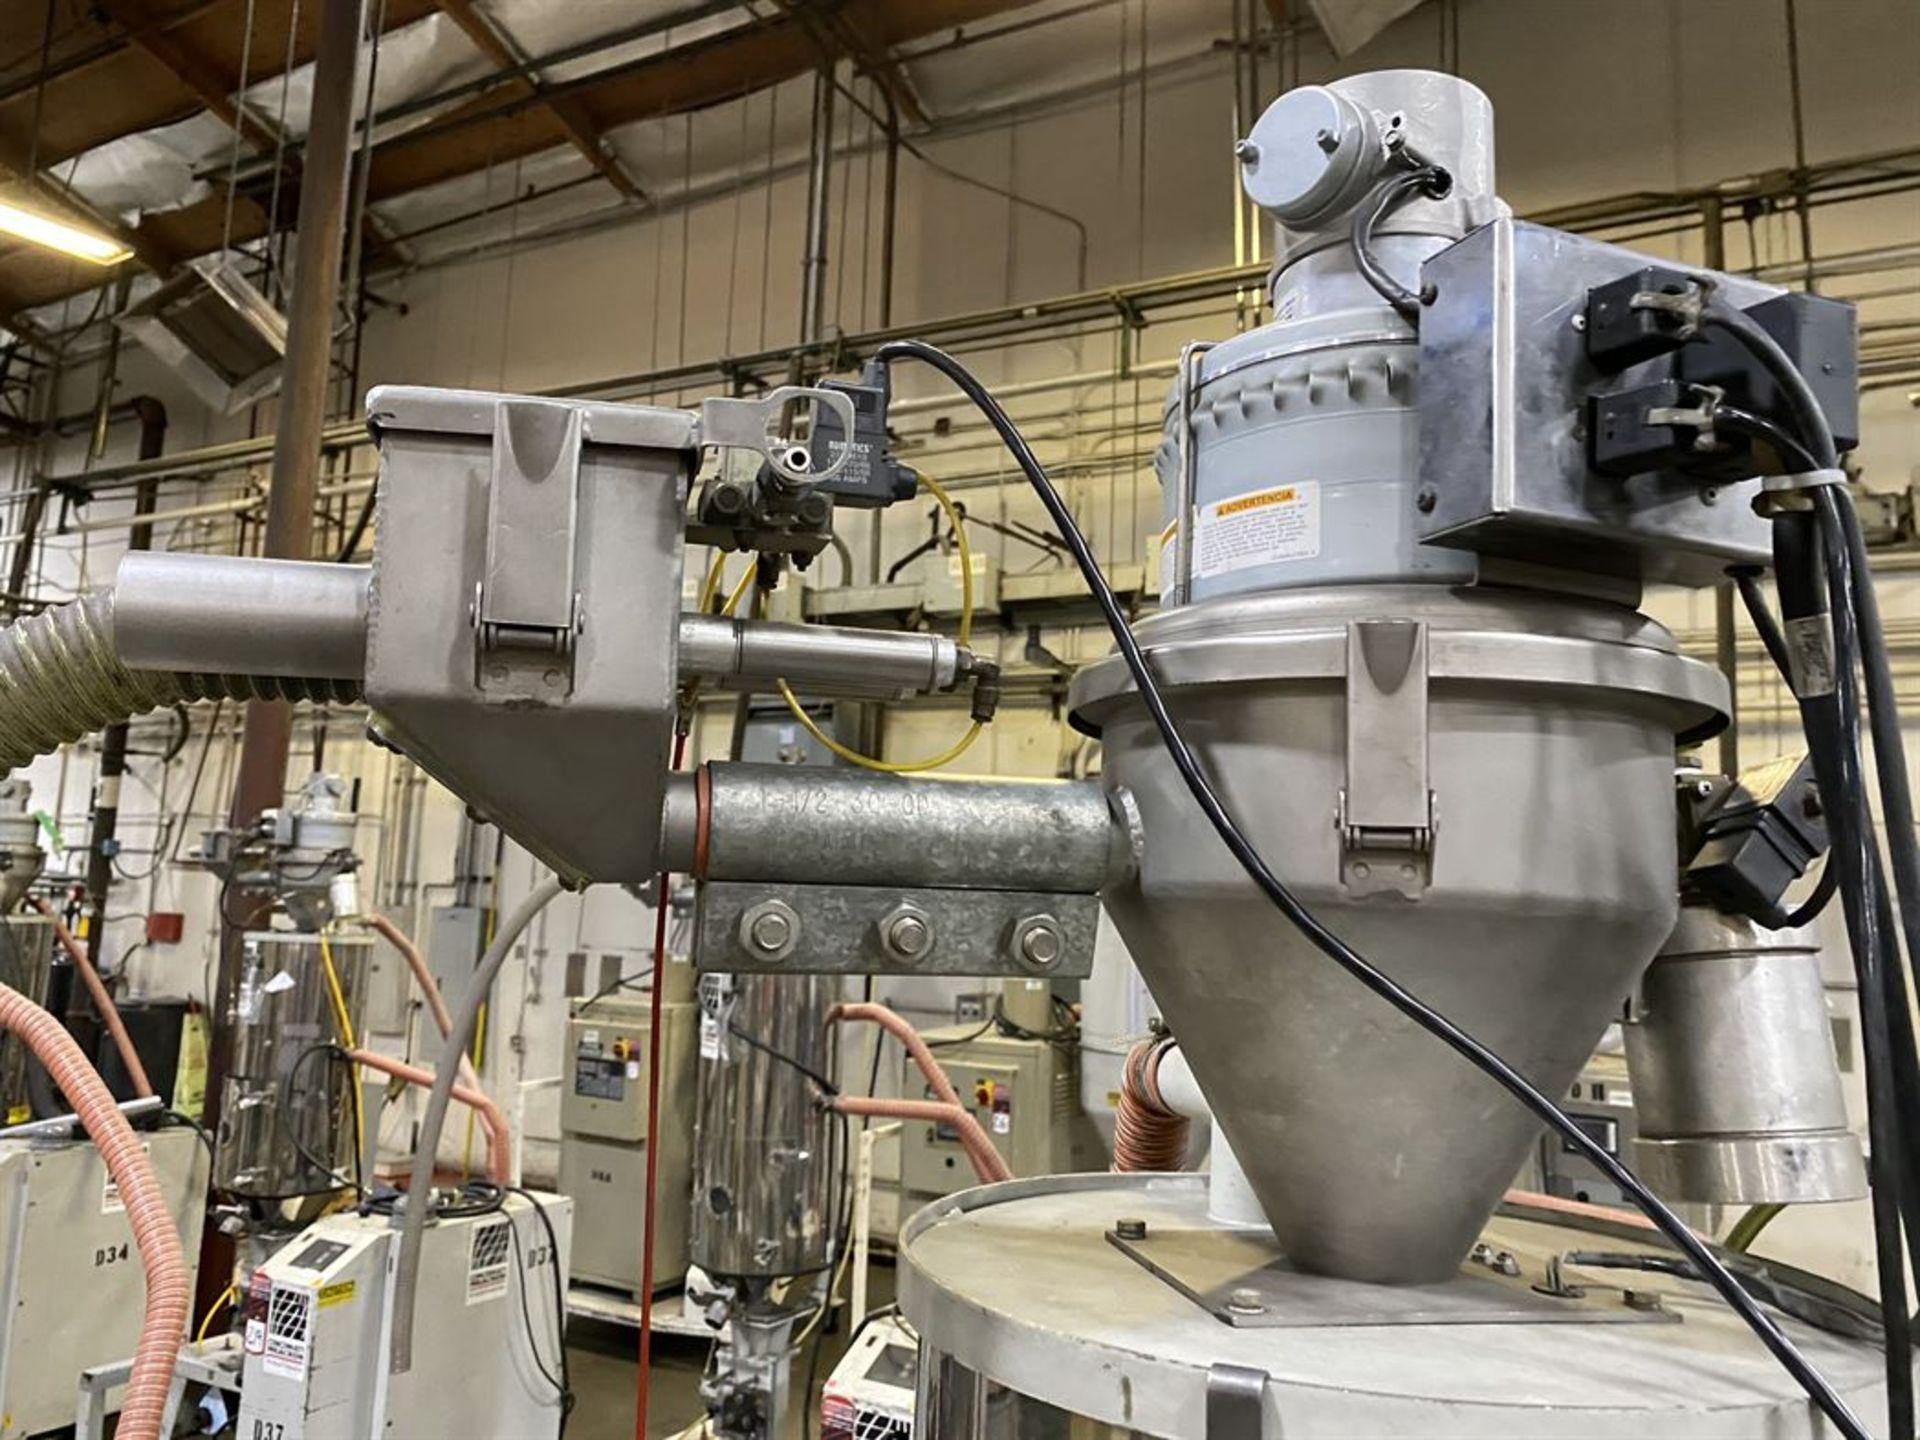 Lot 226 - Cincinnati Milacron M-GS-60 Hopper Dryer System, s/n 3933A01-04-27, w/ Vacuum Loader